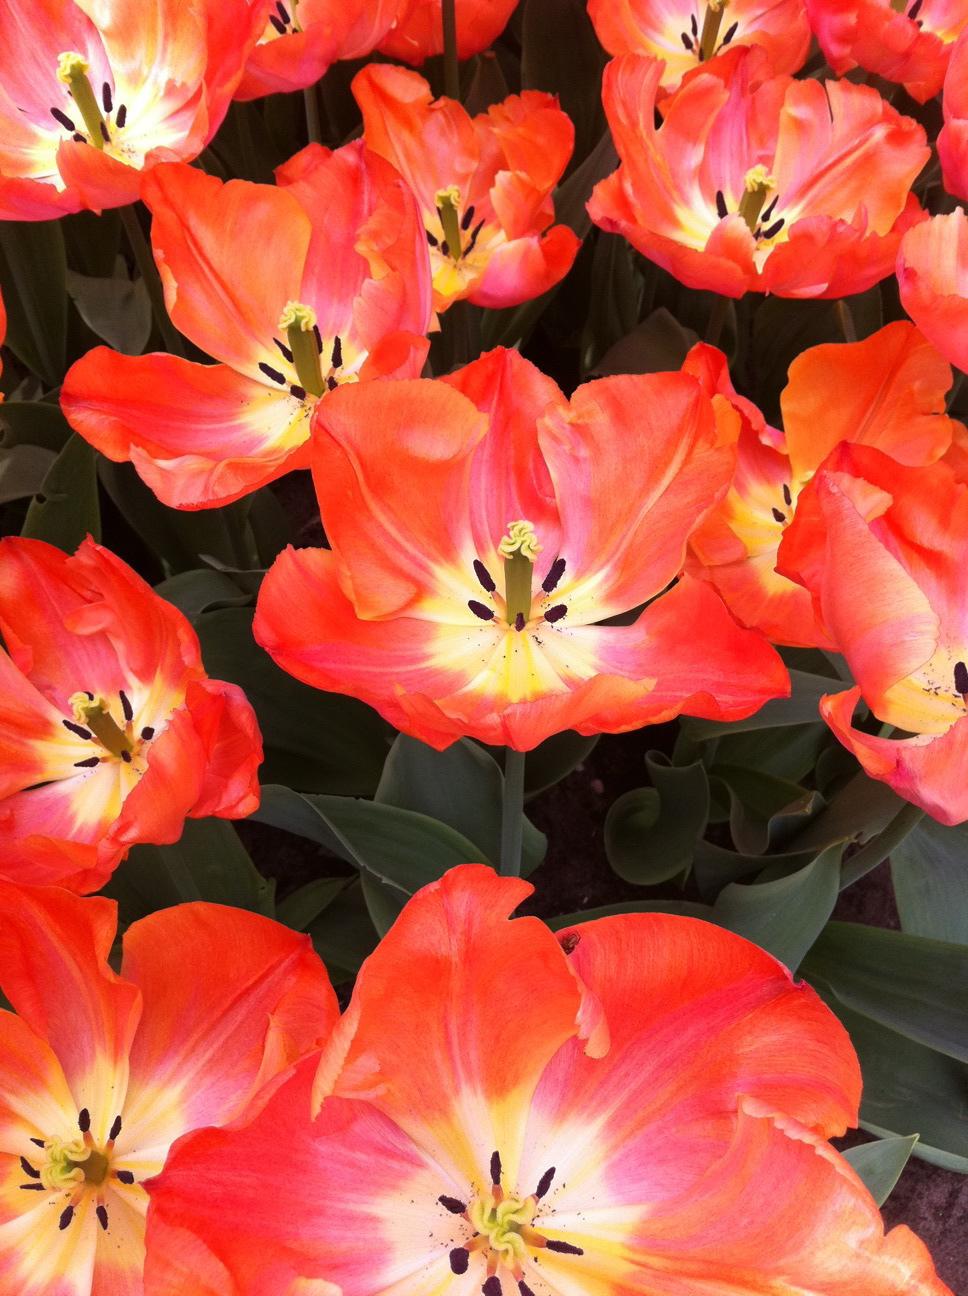 2011-04-22-photo48.jpg